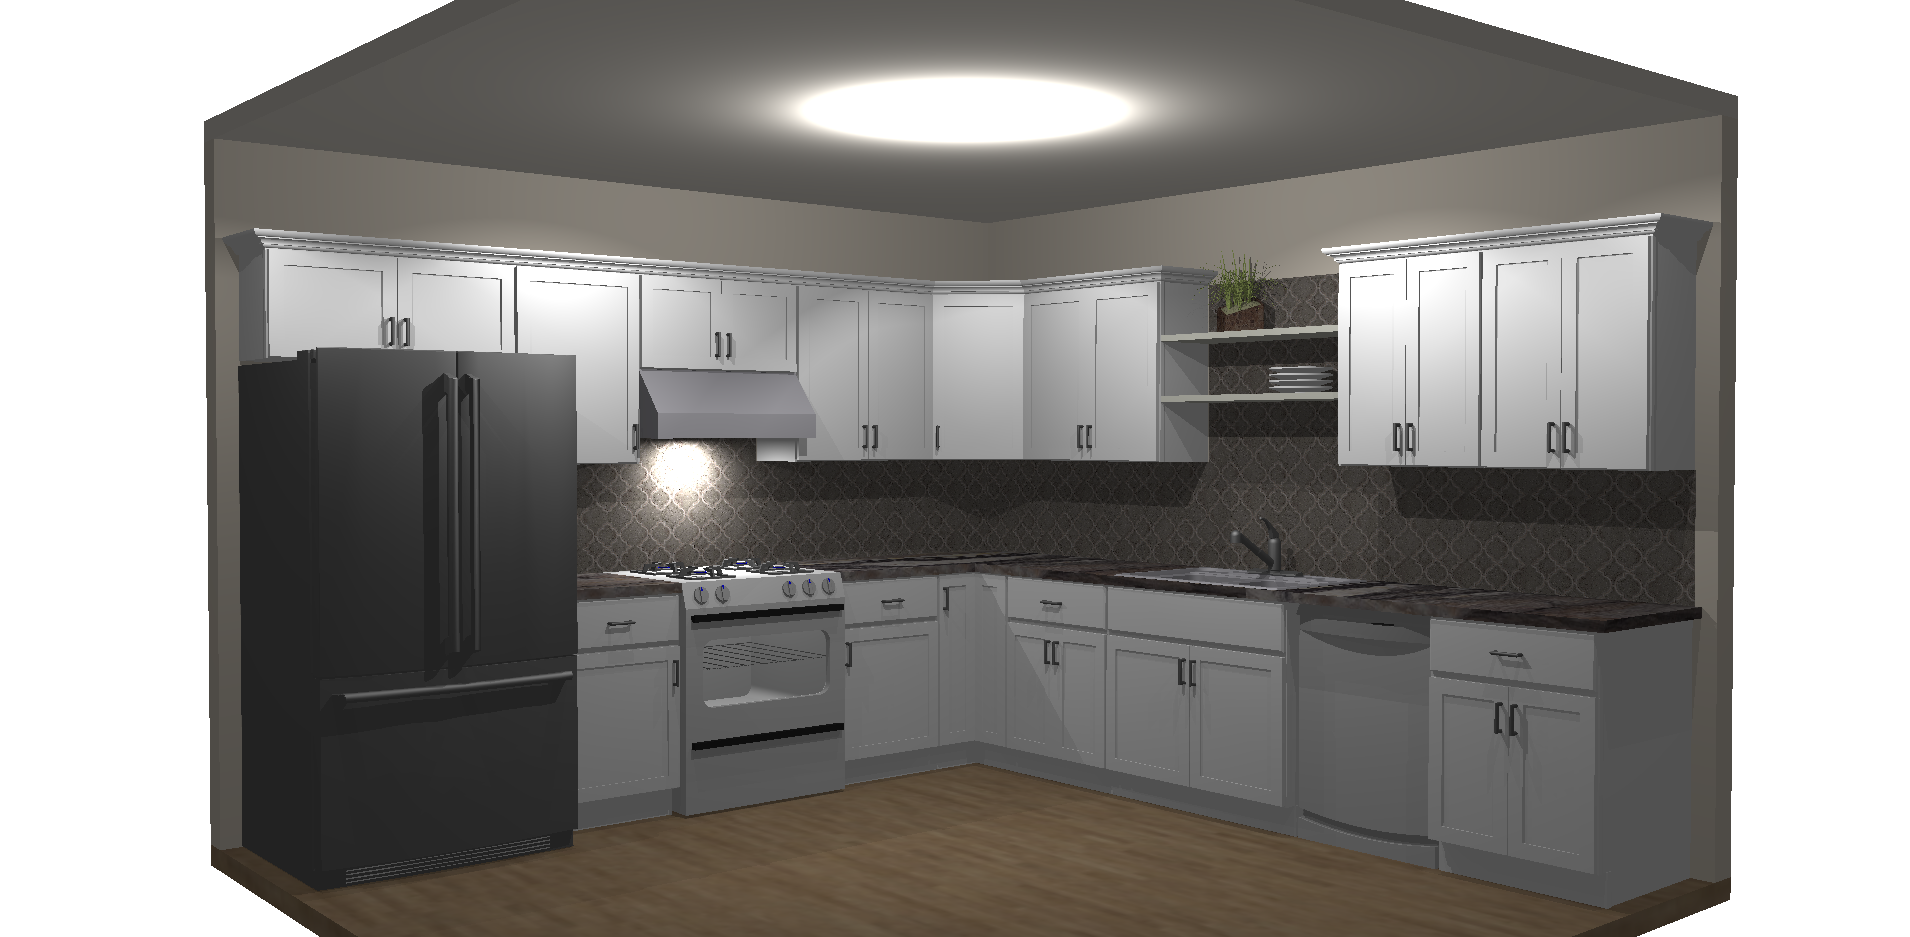 Kitchen Decor Cheap Kitchen Remodeling: NEW! Kitchen Design Package